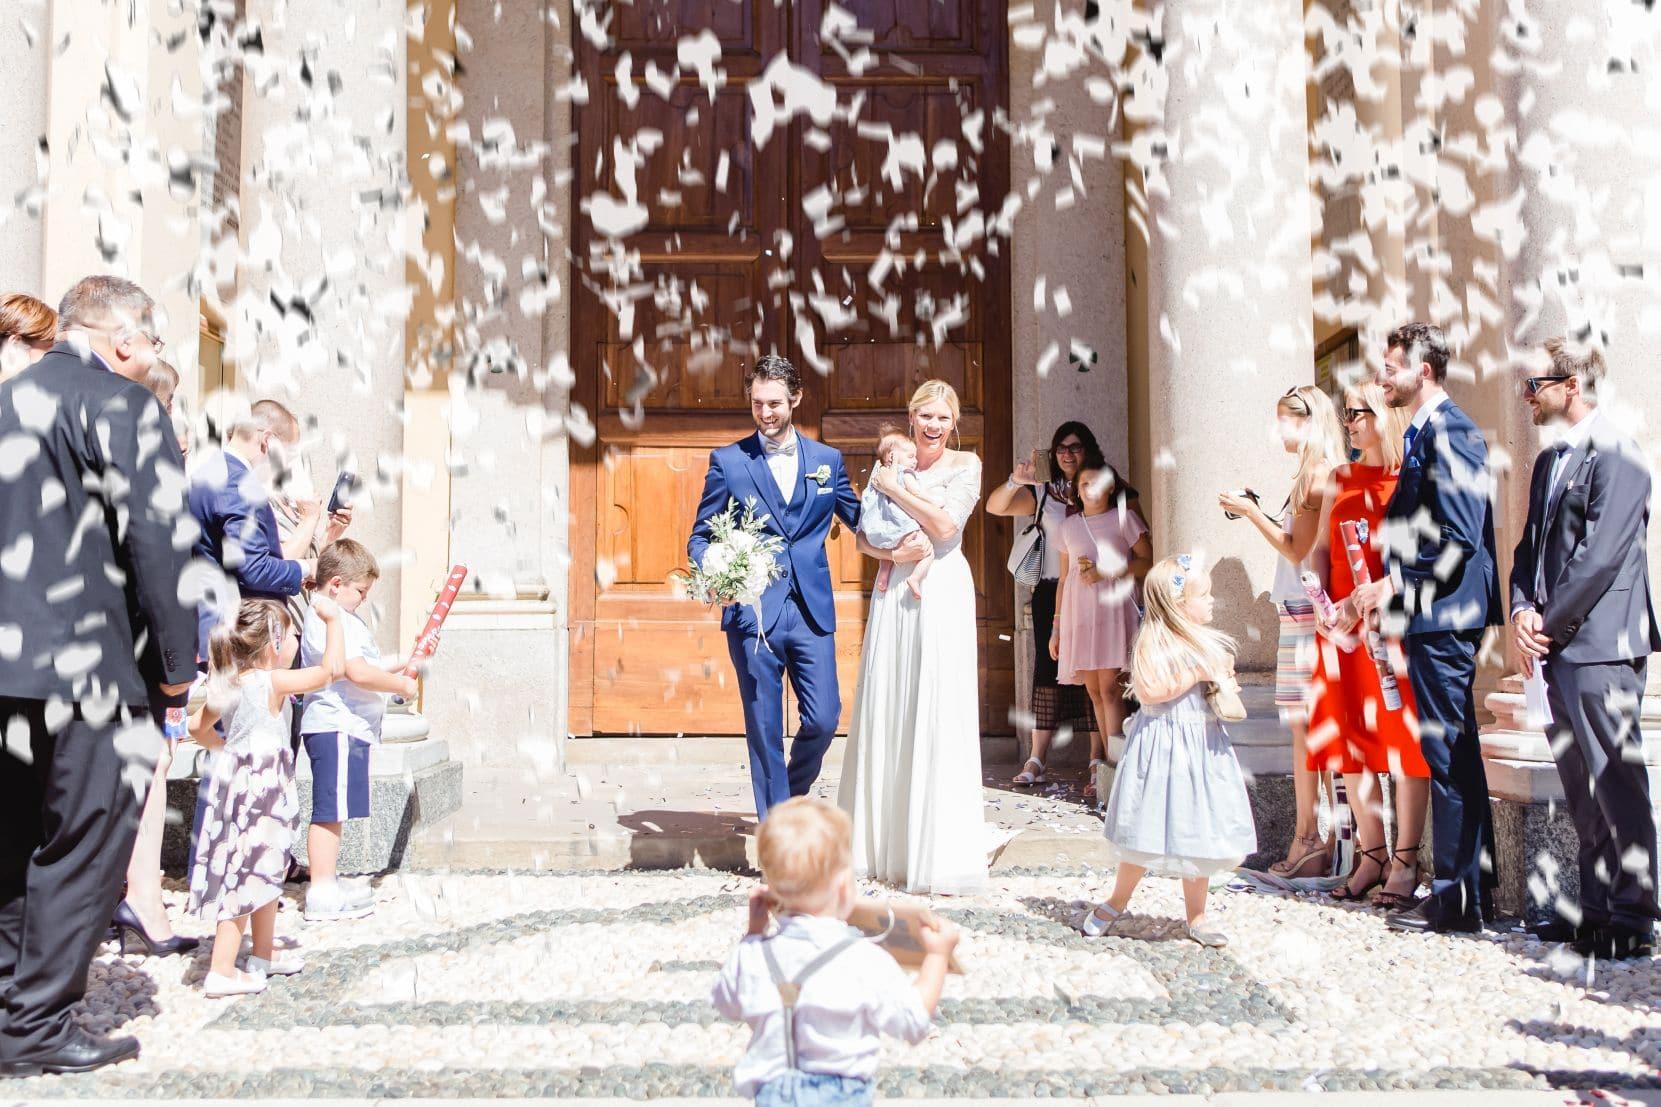 Million Memories_A&D_Hochzeitsfotograf_Schlosshochzeit_Toskana_Lago Di Como_Wedding_Tuscany_093